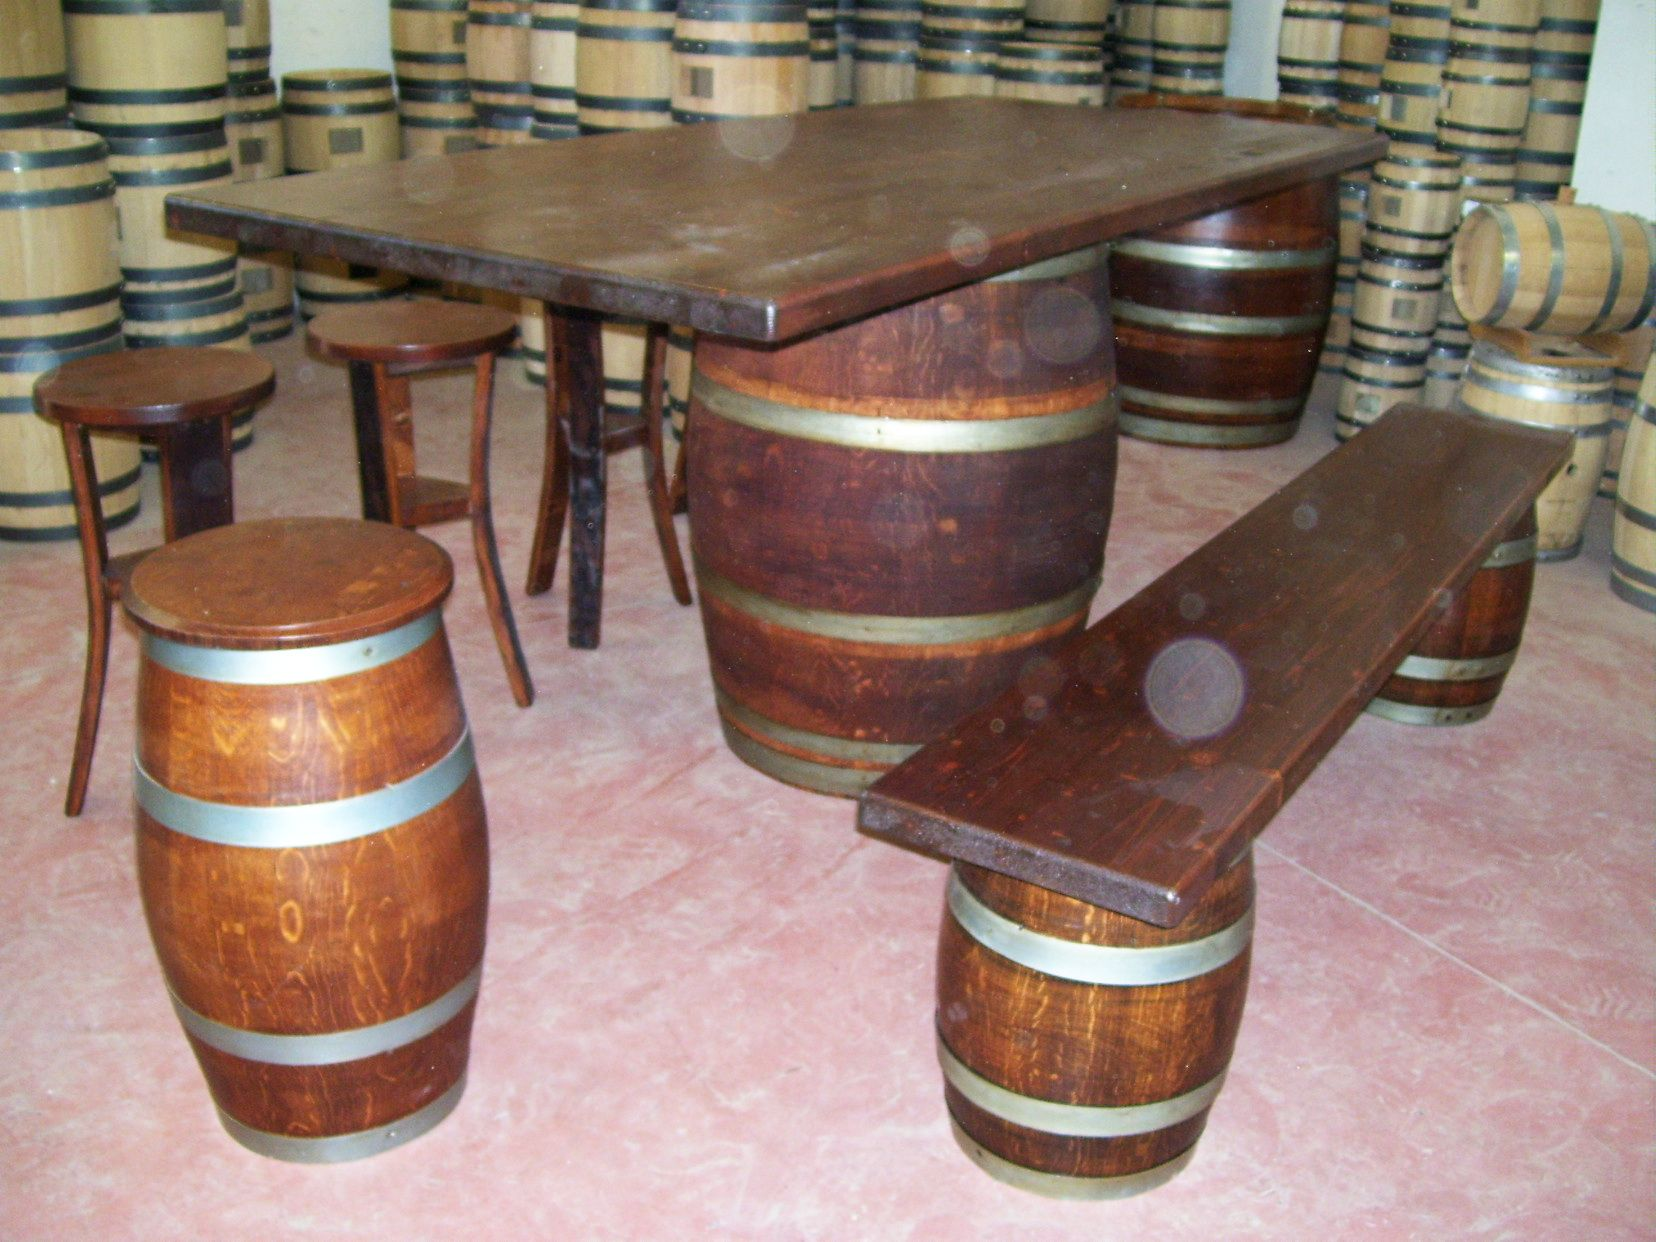 Botte arredamento ~ 1275 #tavolo da #birreria e #osteria da 2 metri con #panca a